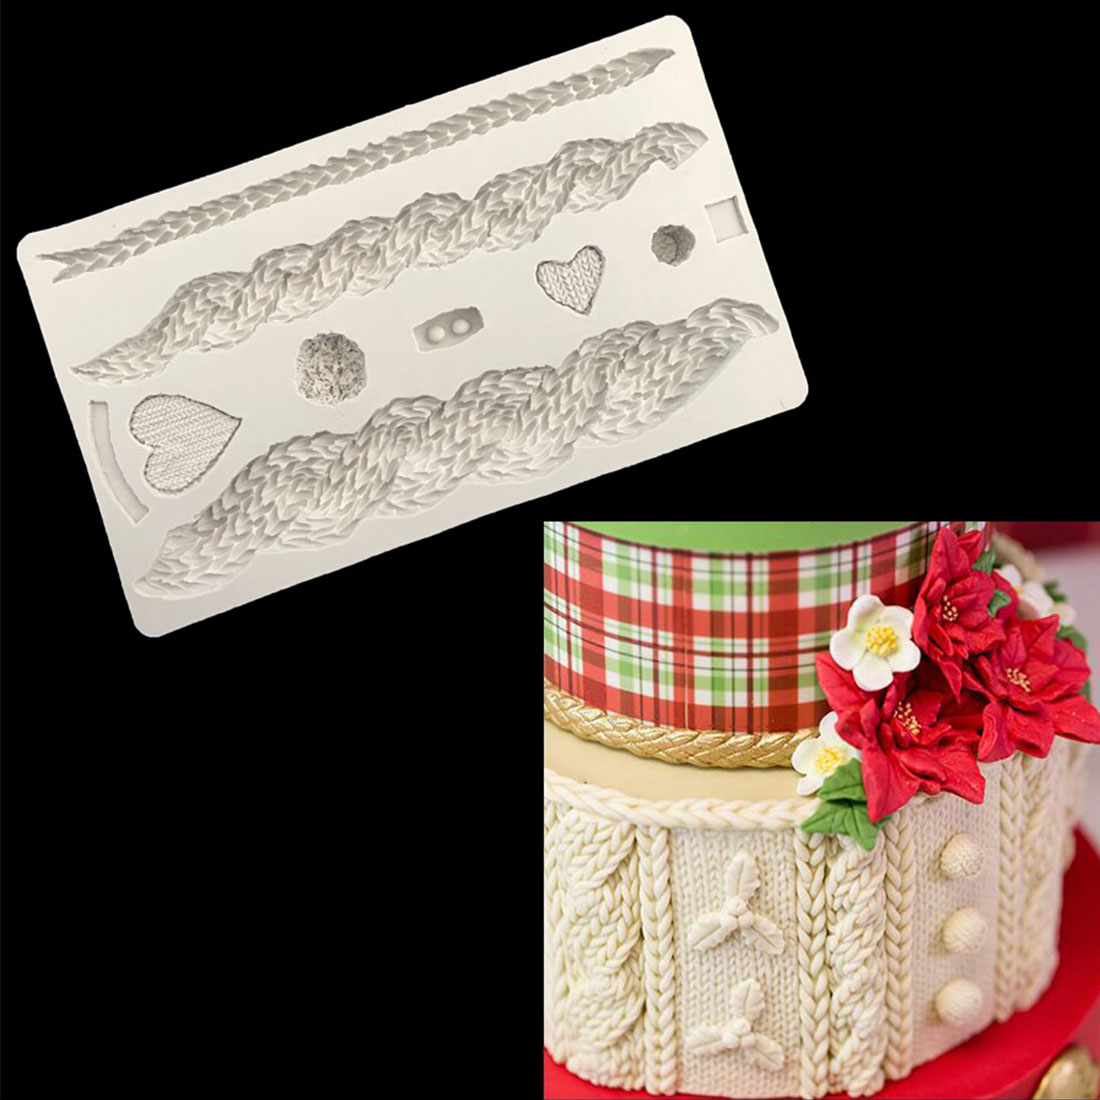 Newest! 3D Knitting Texture Silicone Mold Christmas Cake Border Fondant Molds Cake Decorating Tools Chocolate Gumpaste Mould